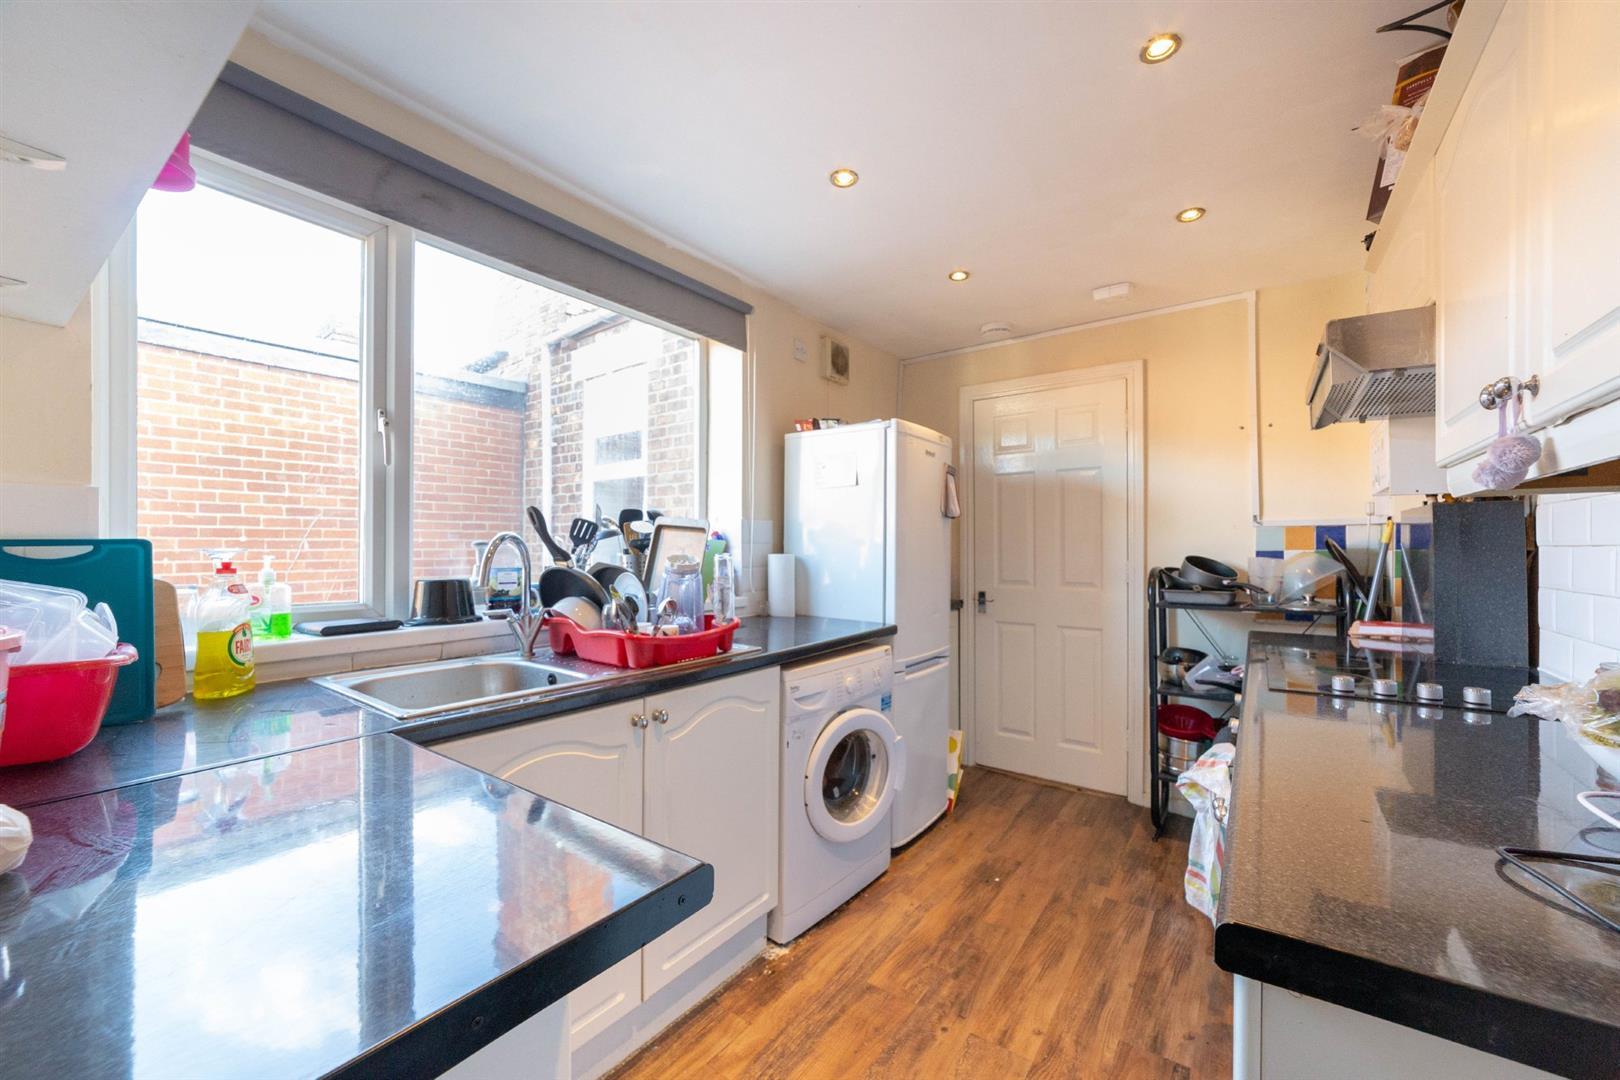 5 bed maisonette to rent in Newcastle Upon Tyne, NE6 5AR 0